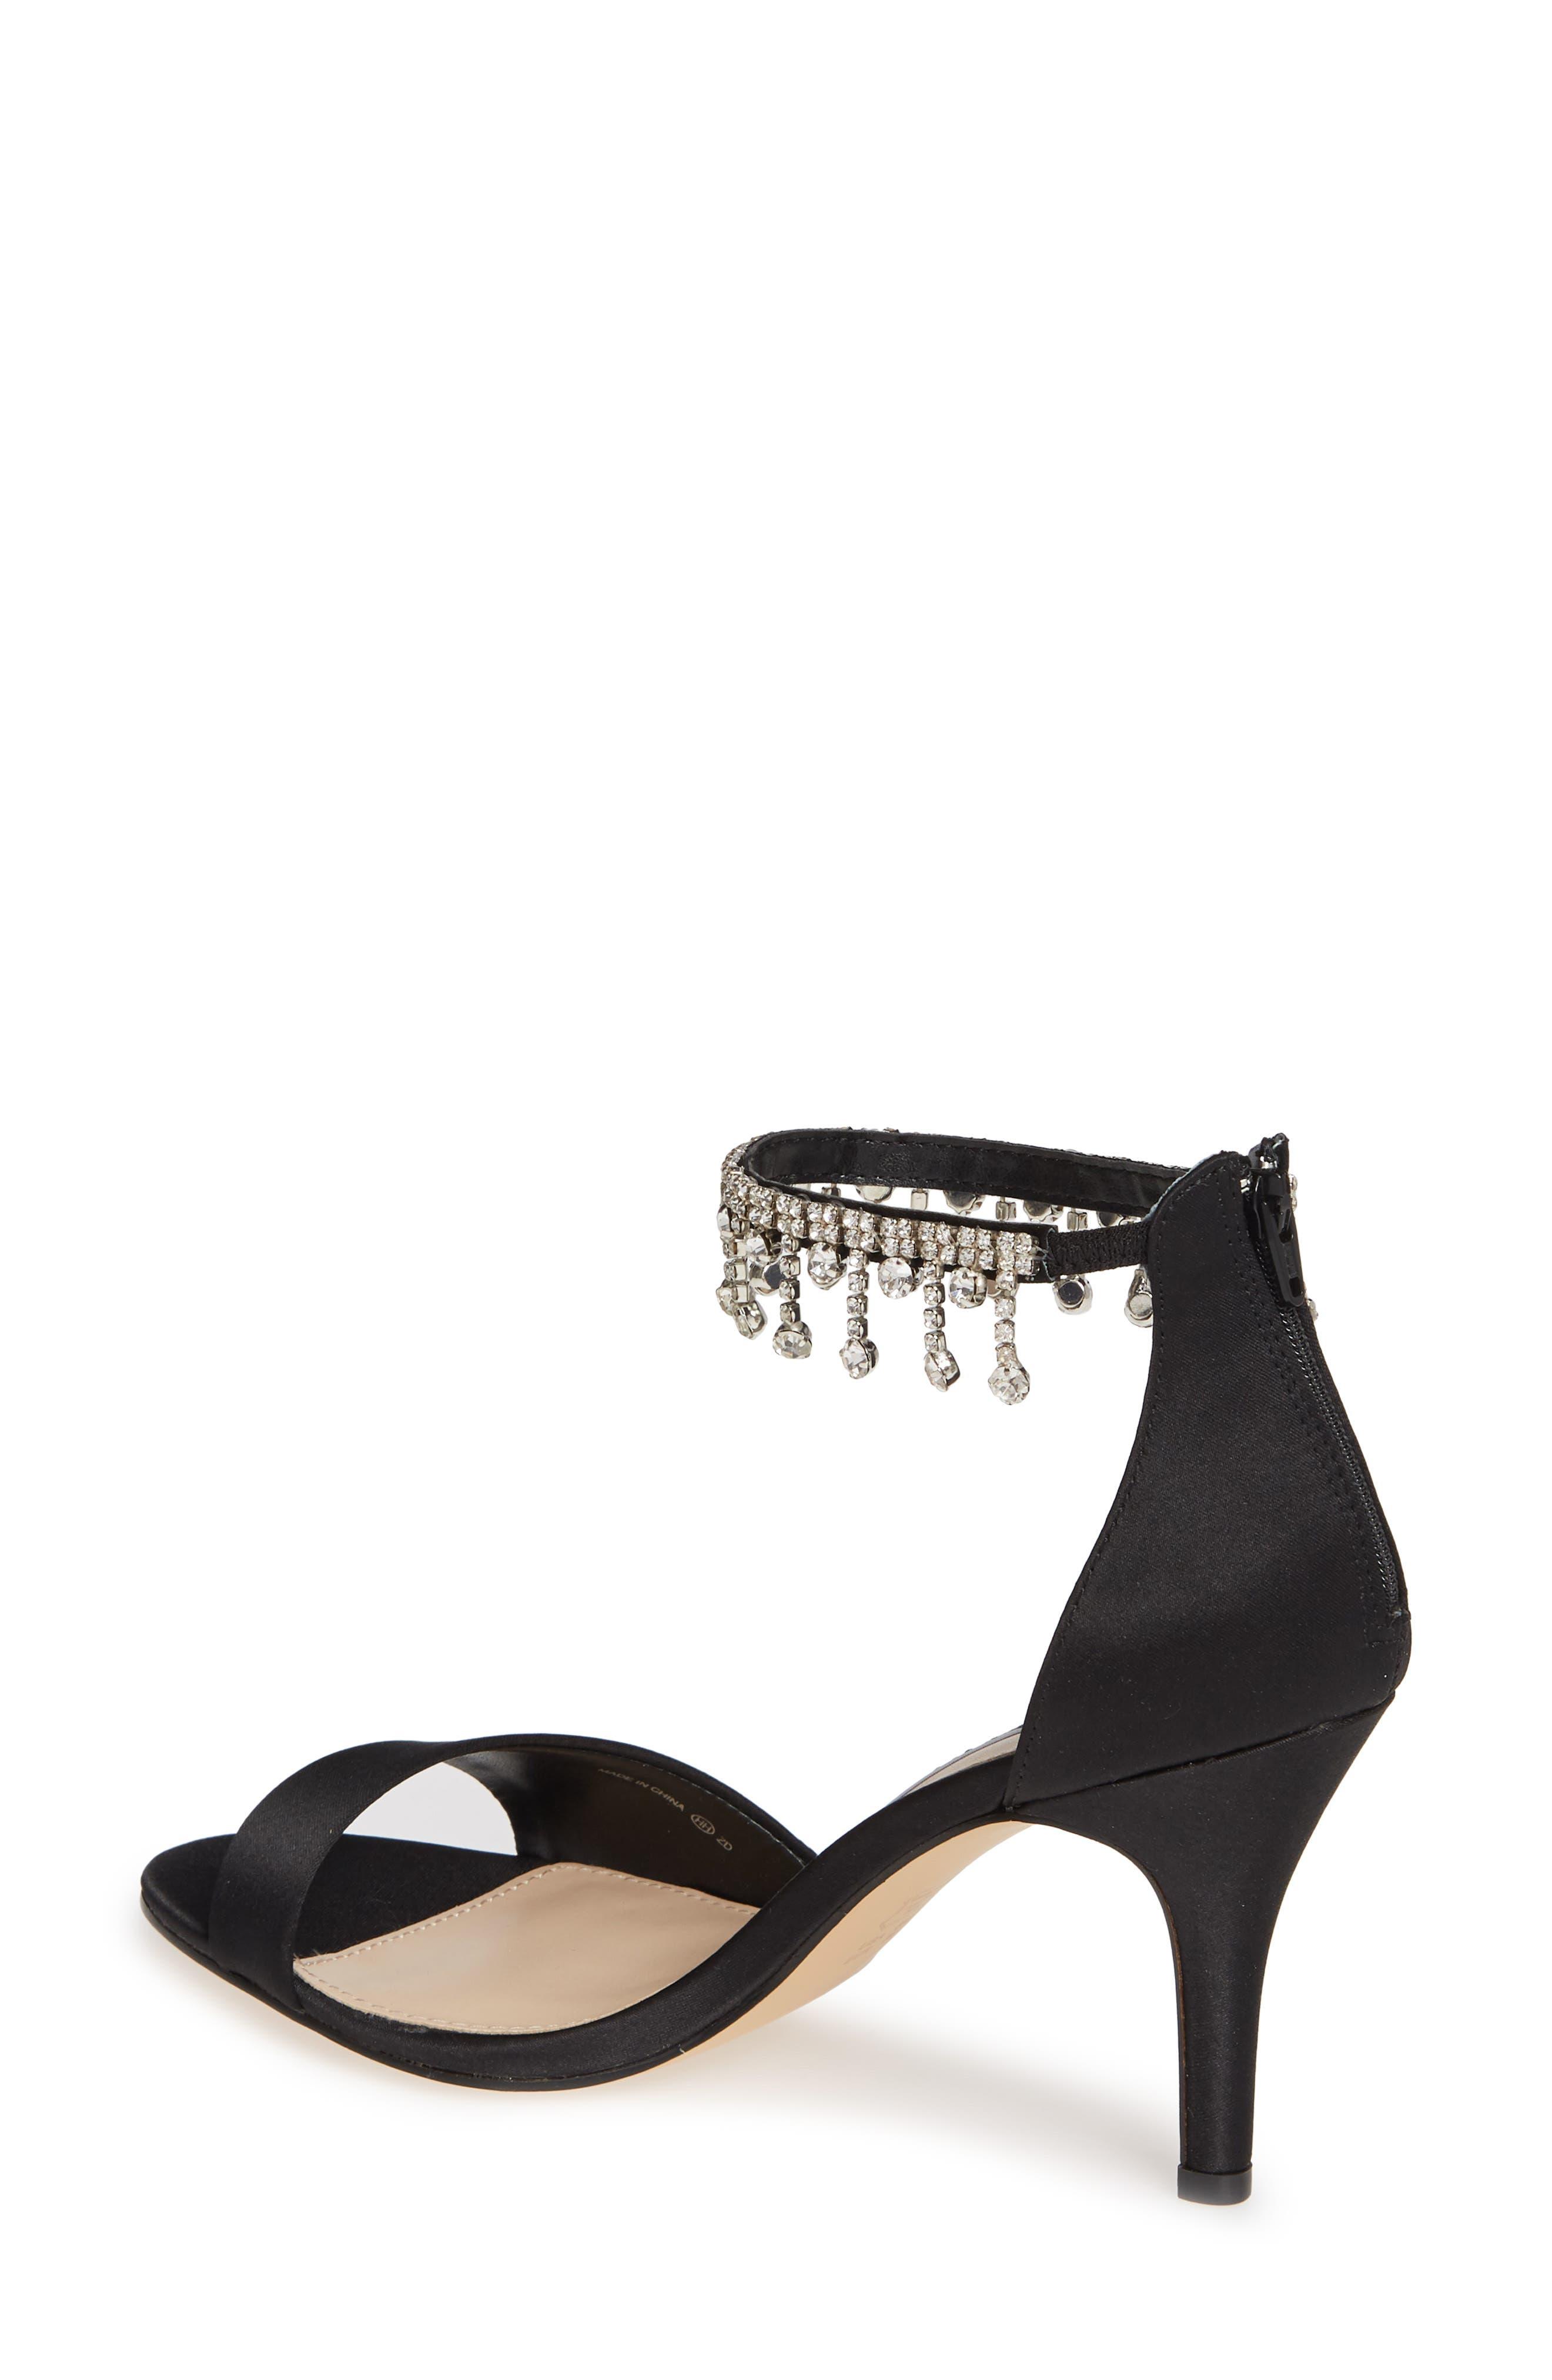 NINA, Vera Embellished Ankle Strap Sandal, Alternate thumbnail 2, color, BLACK SATIN